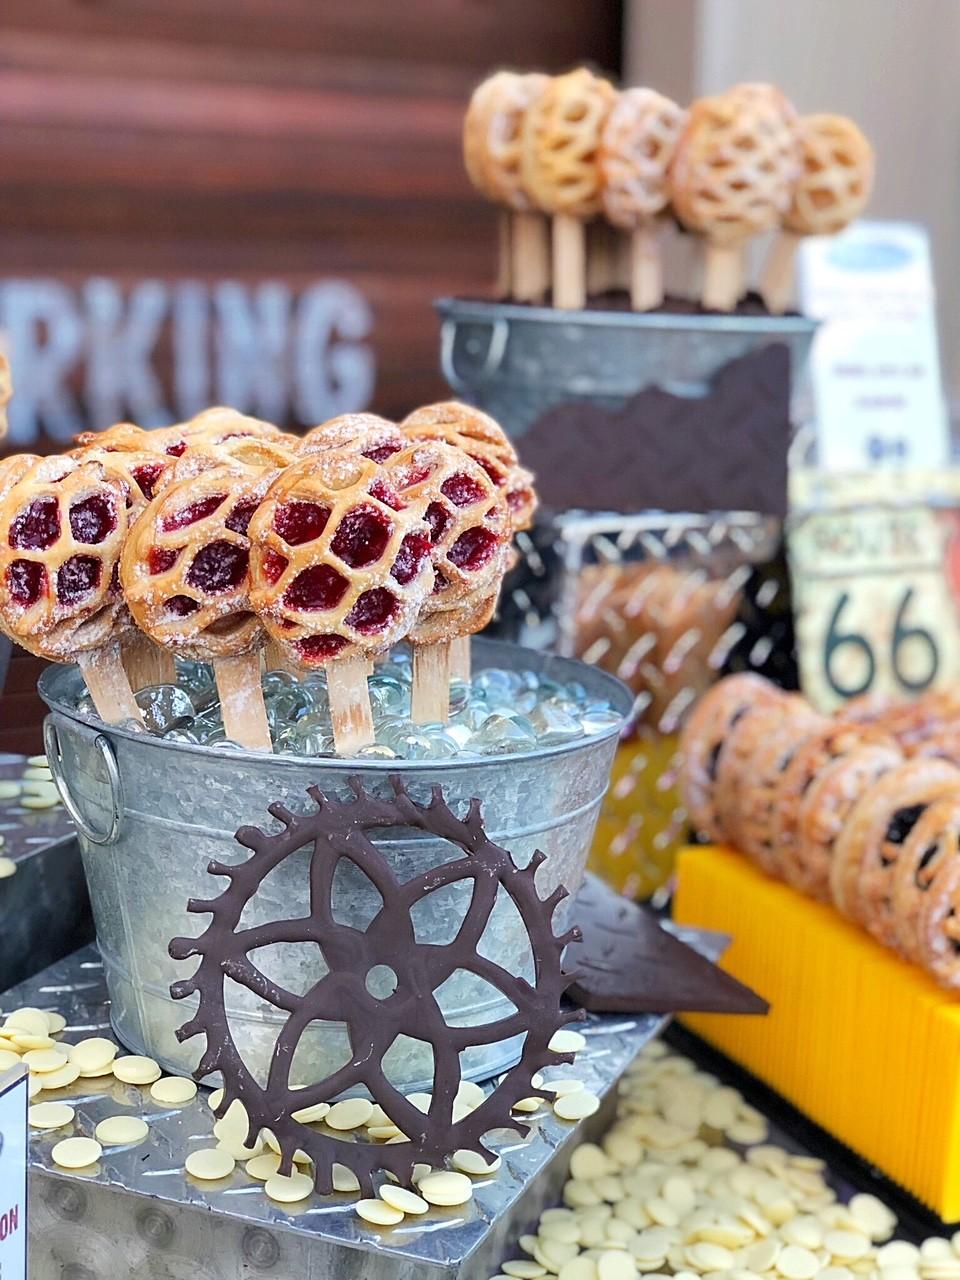 Torta de cereja no palito em formato de roda de carro - deliciosa